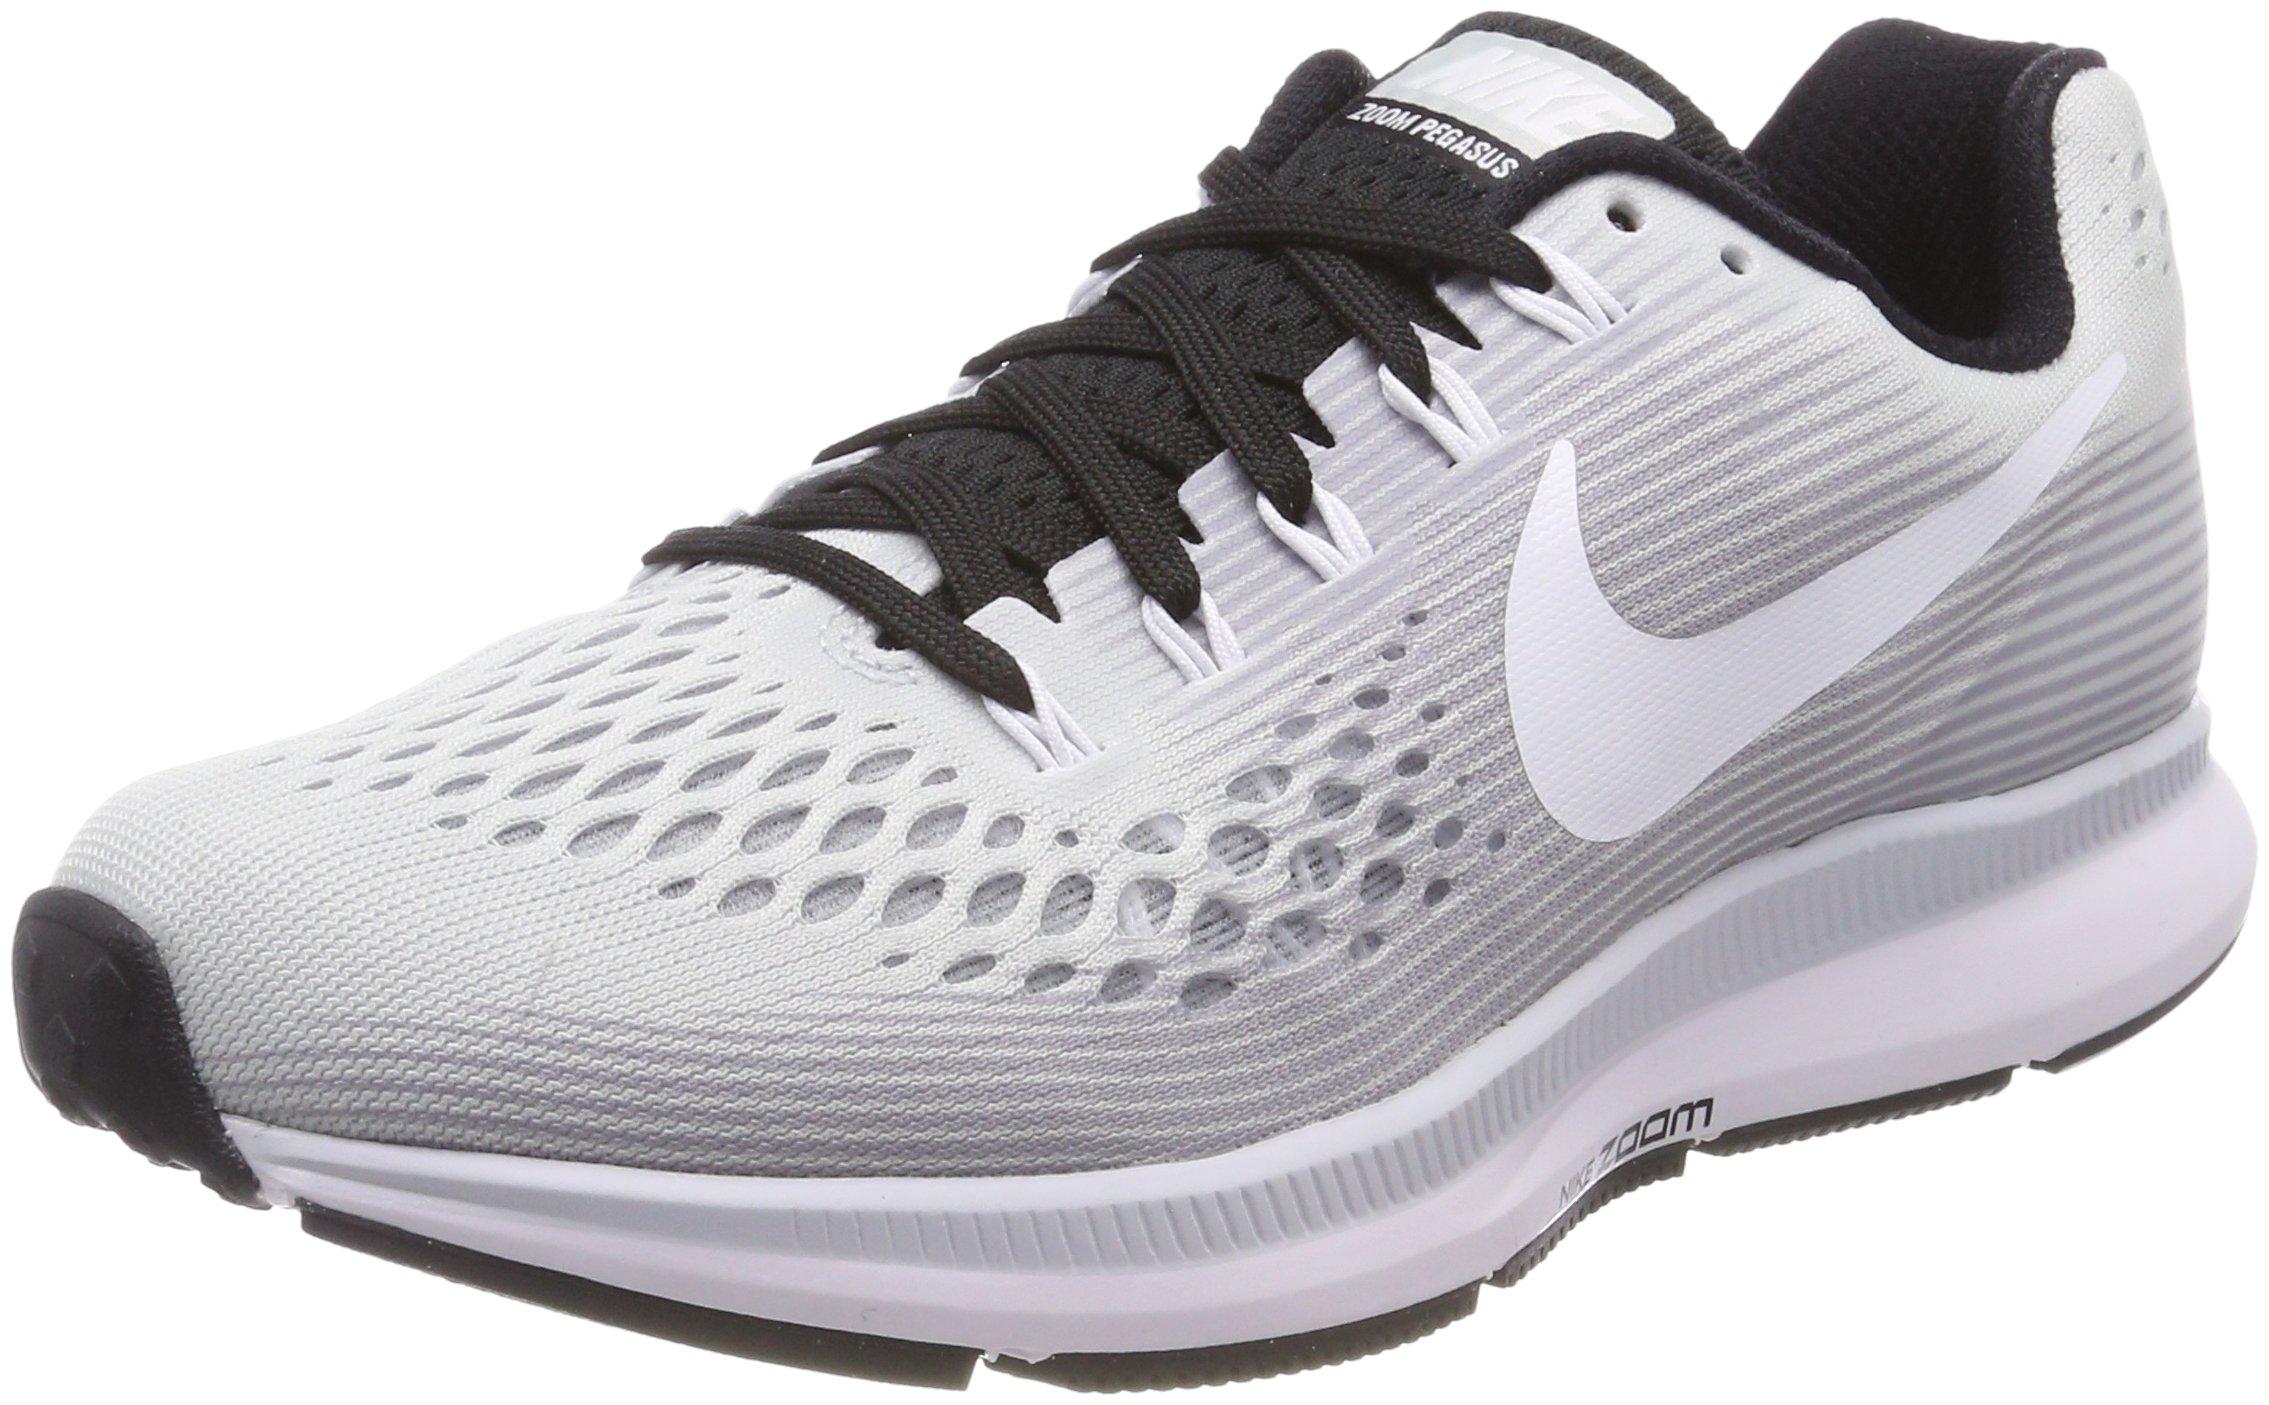 Nike Women's Air Zoom Pegasus 34 Running Shoe (10.5 M US, Pure PlatinumWhite Black)